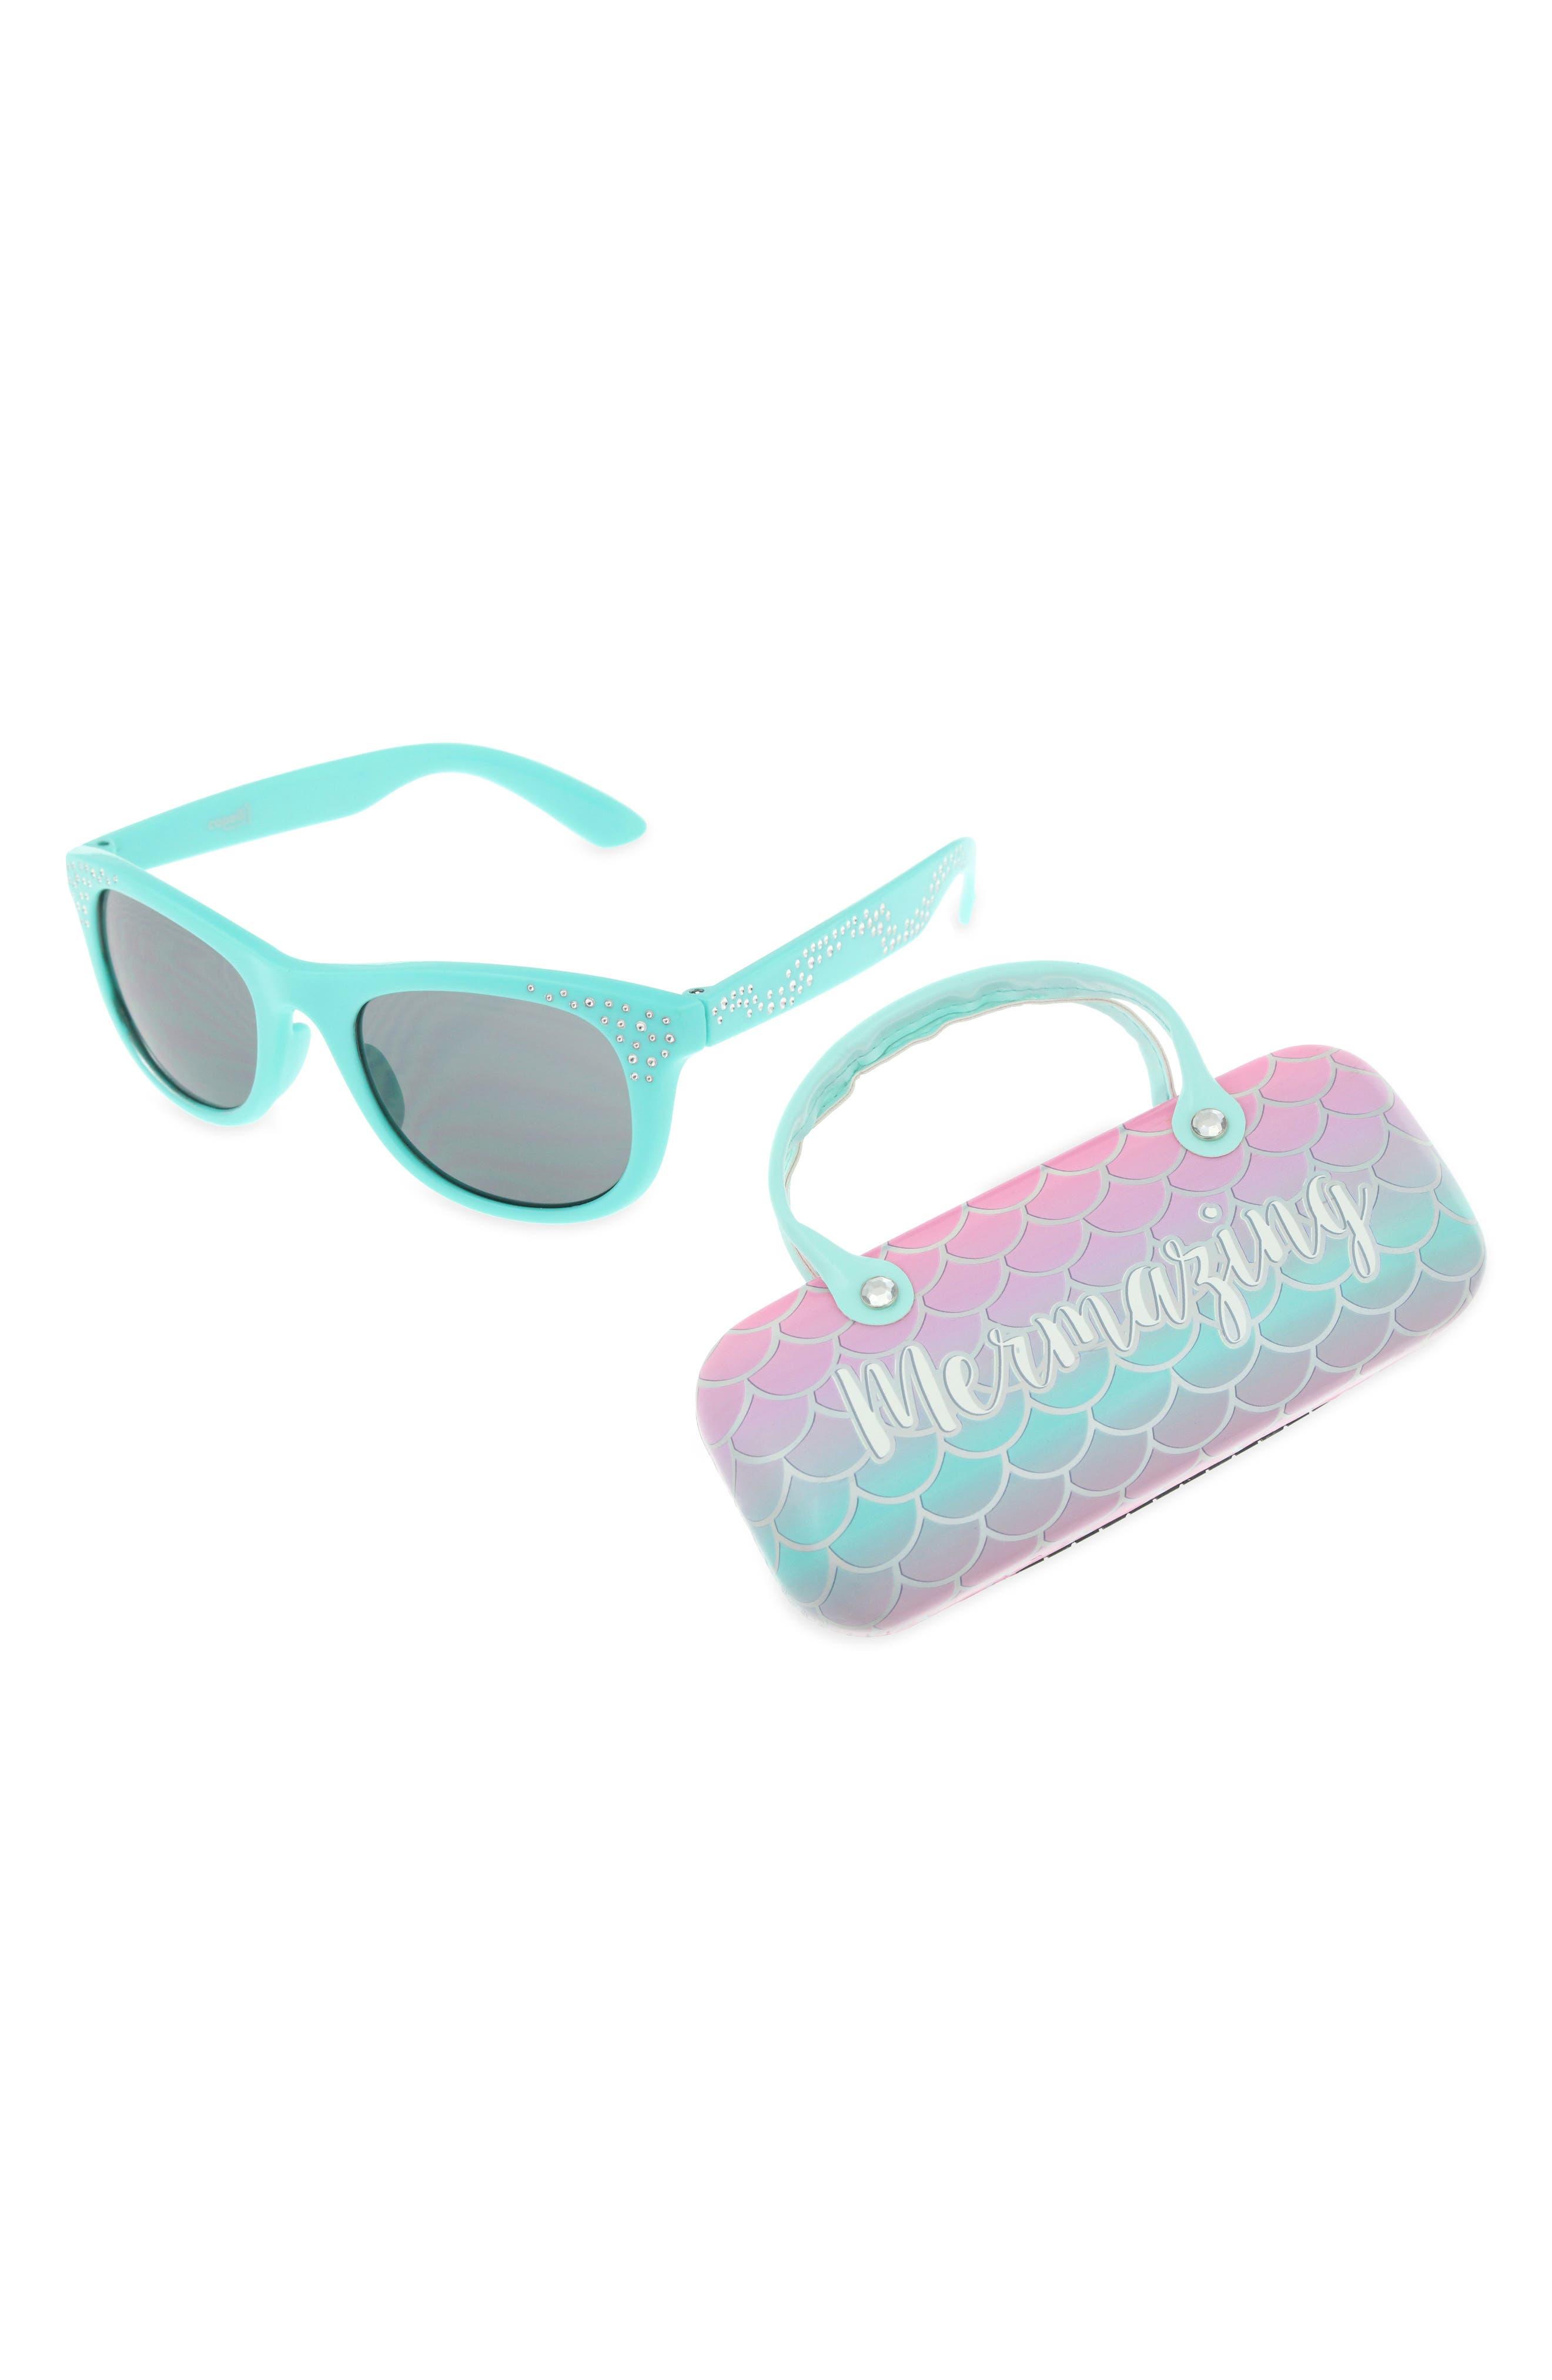 Mermazing 60mm Sunglasses & Case Set,                             Main thumbnail 1, color,                             338